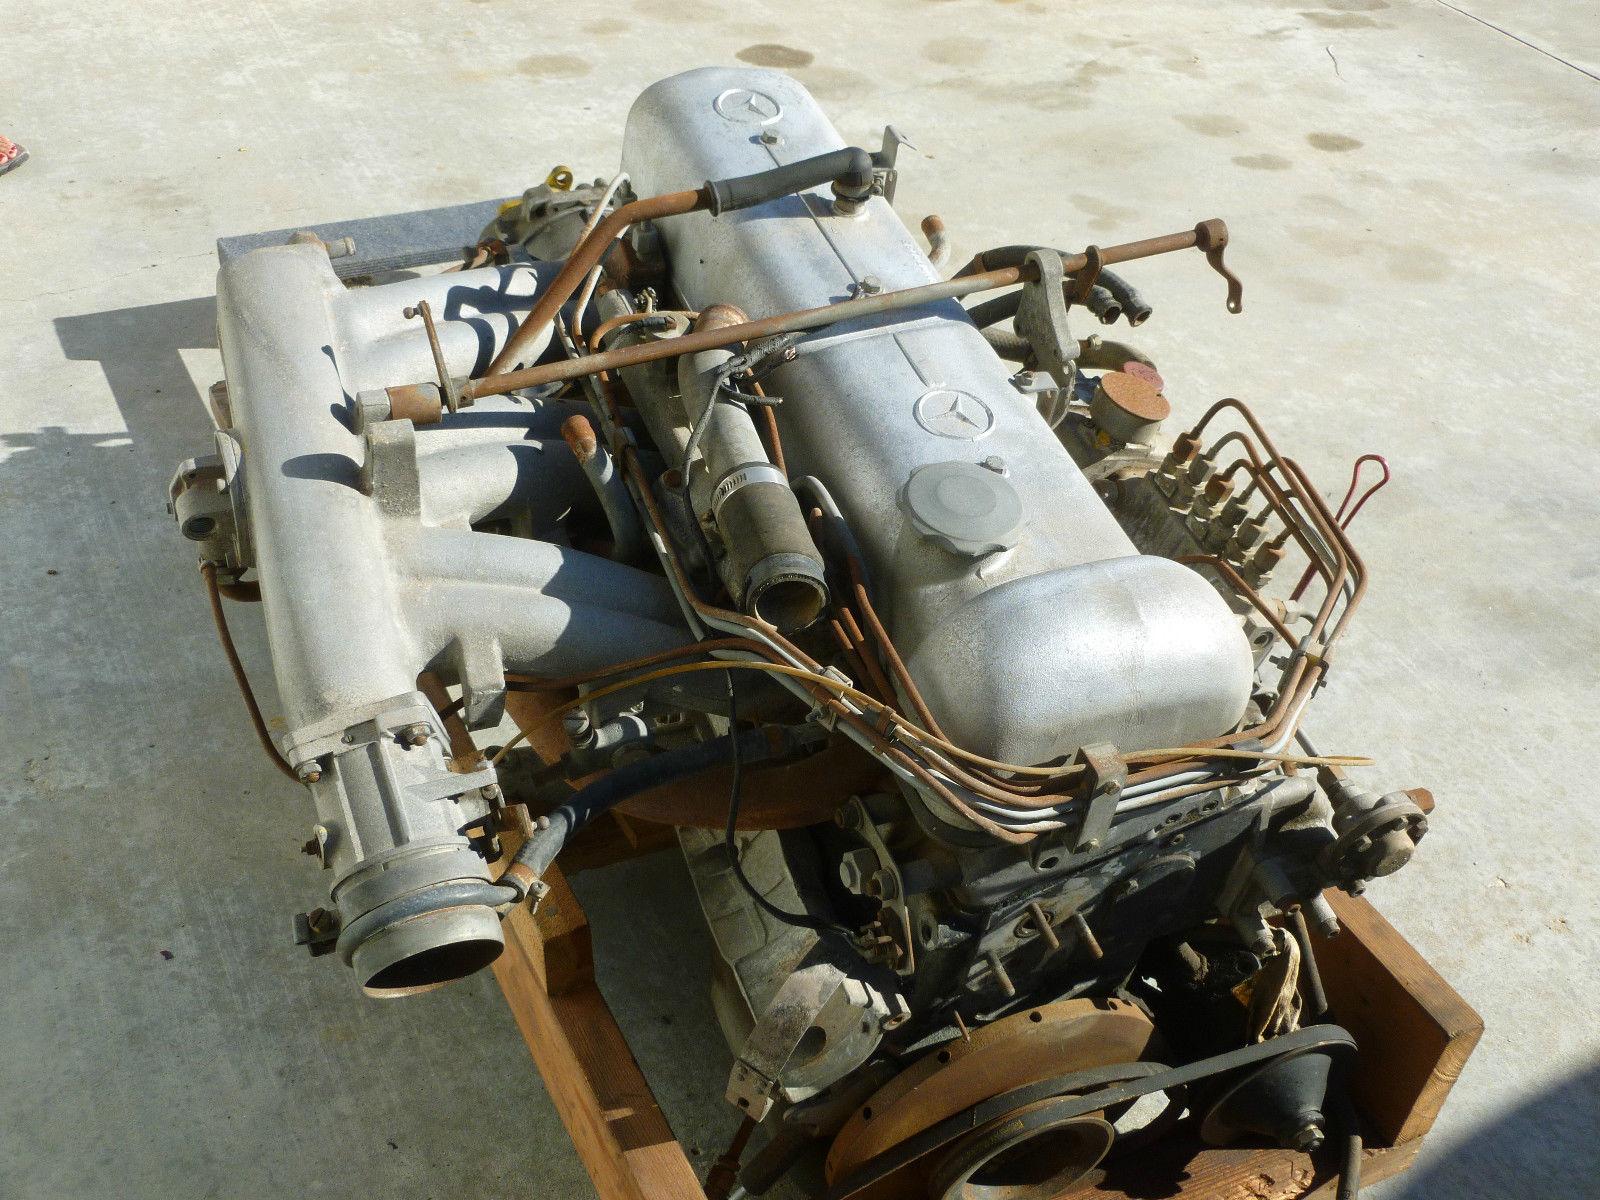 Rare W112 300SE Cpe CA. blk plate car Sunroof, leather w ...